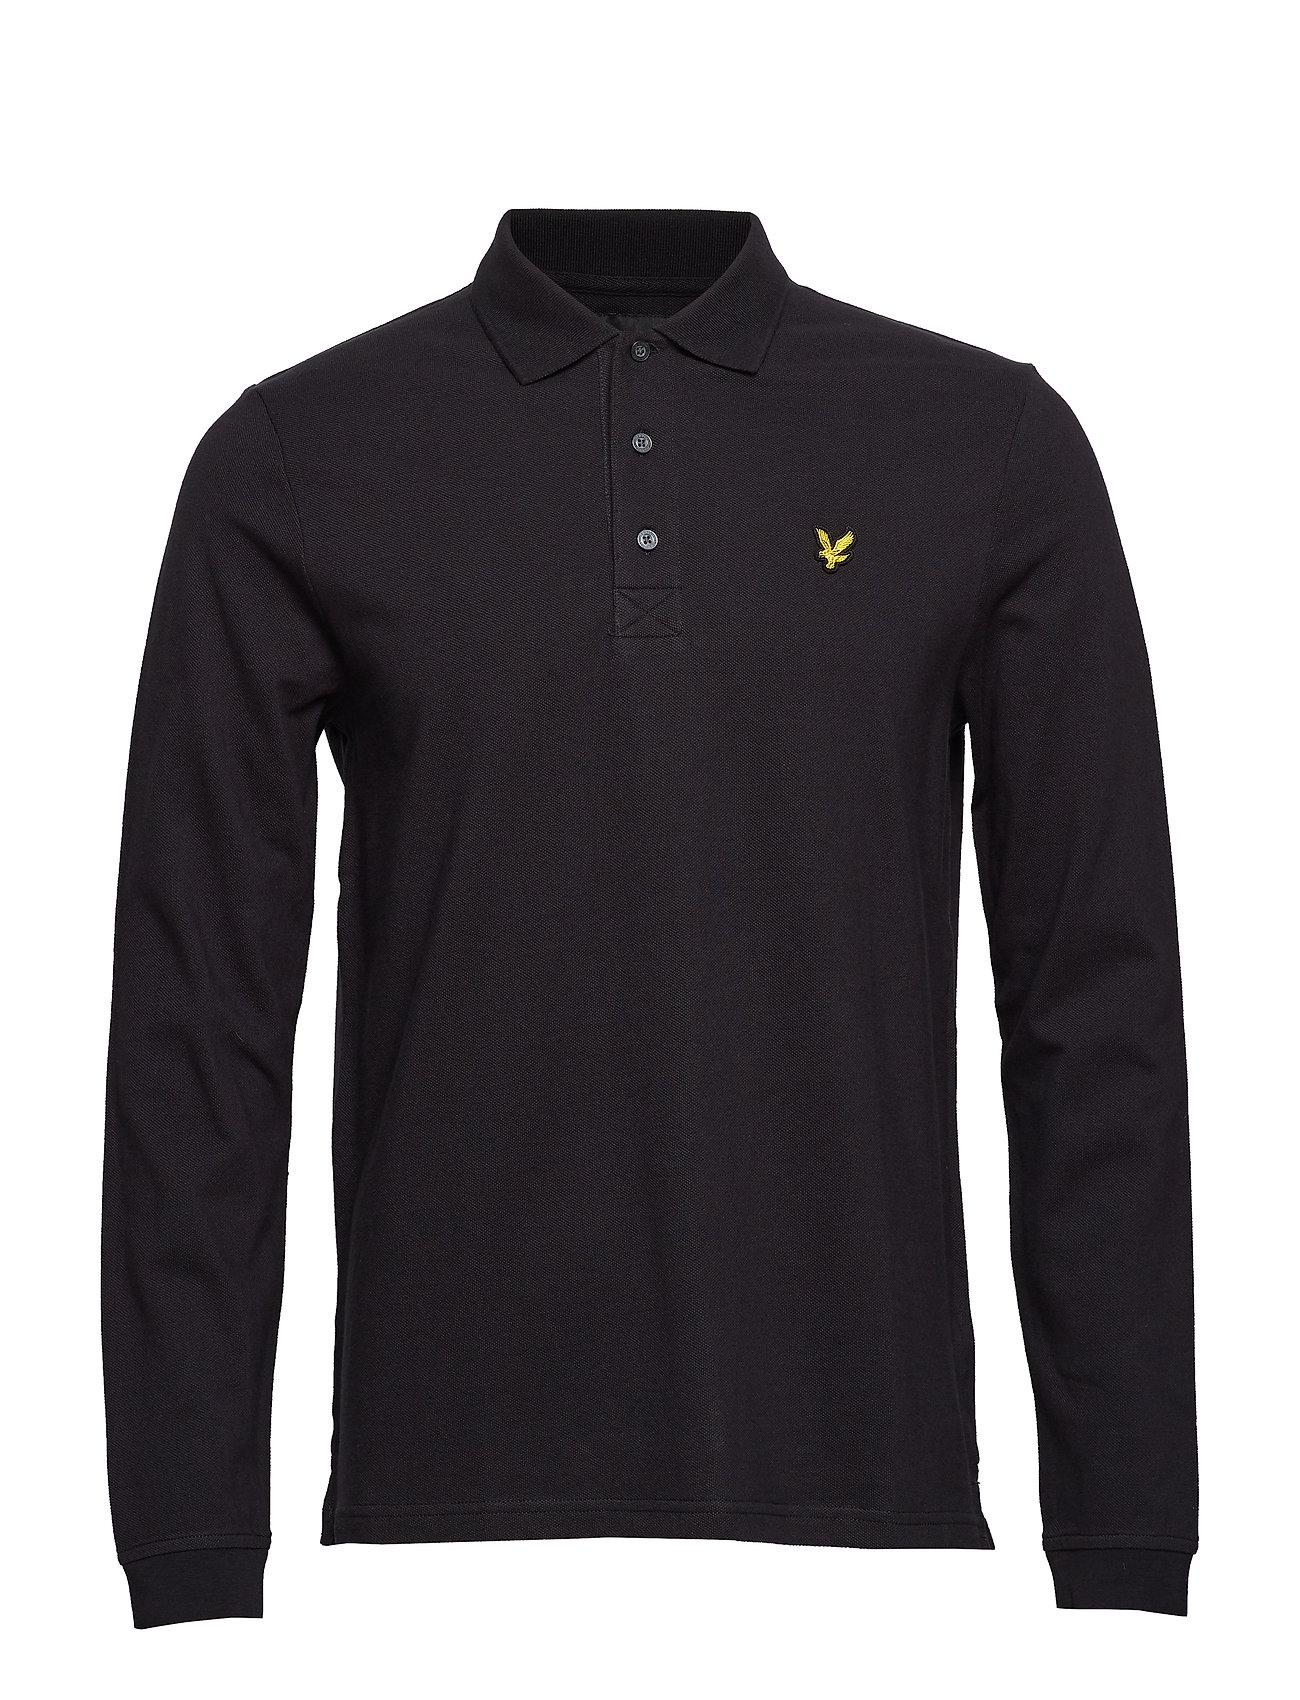 Lyle & Scott LS Polo Shirt - TRUE BLACK